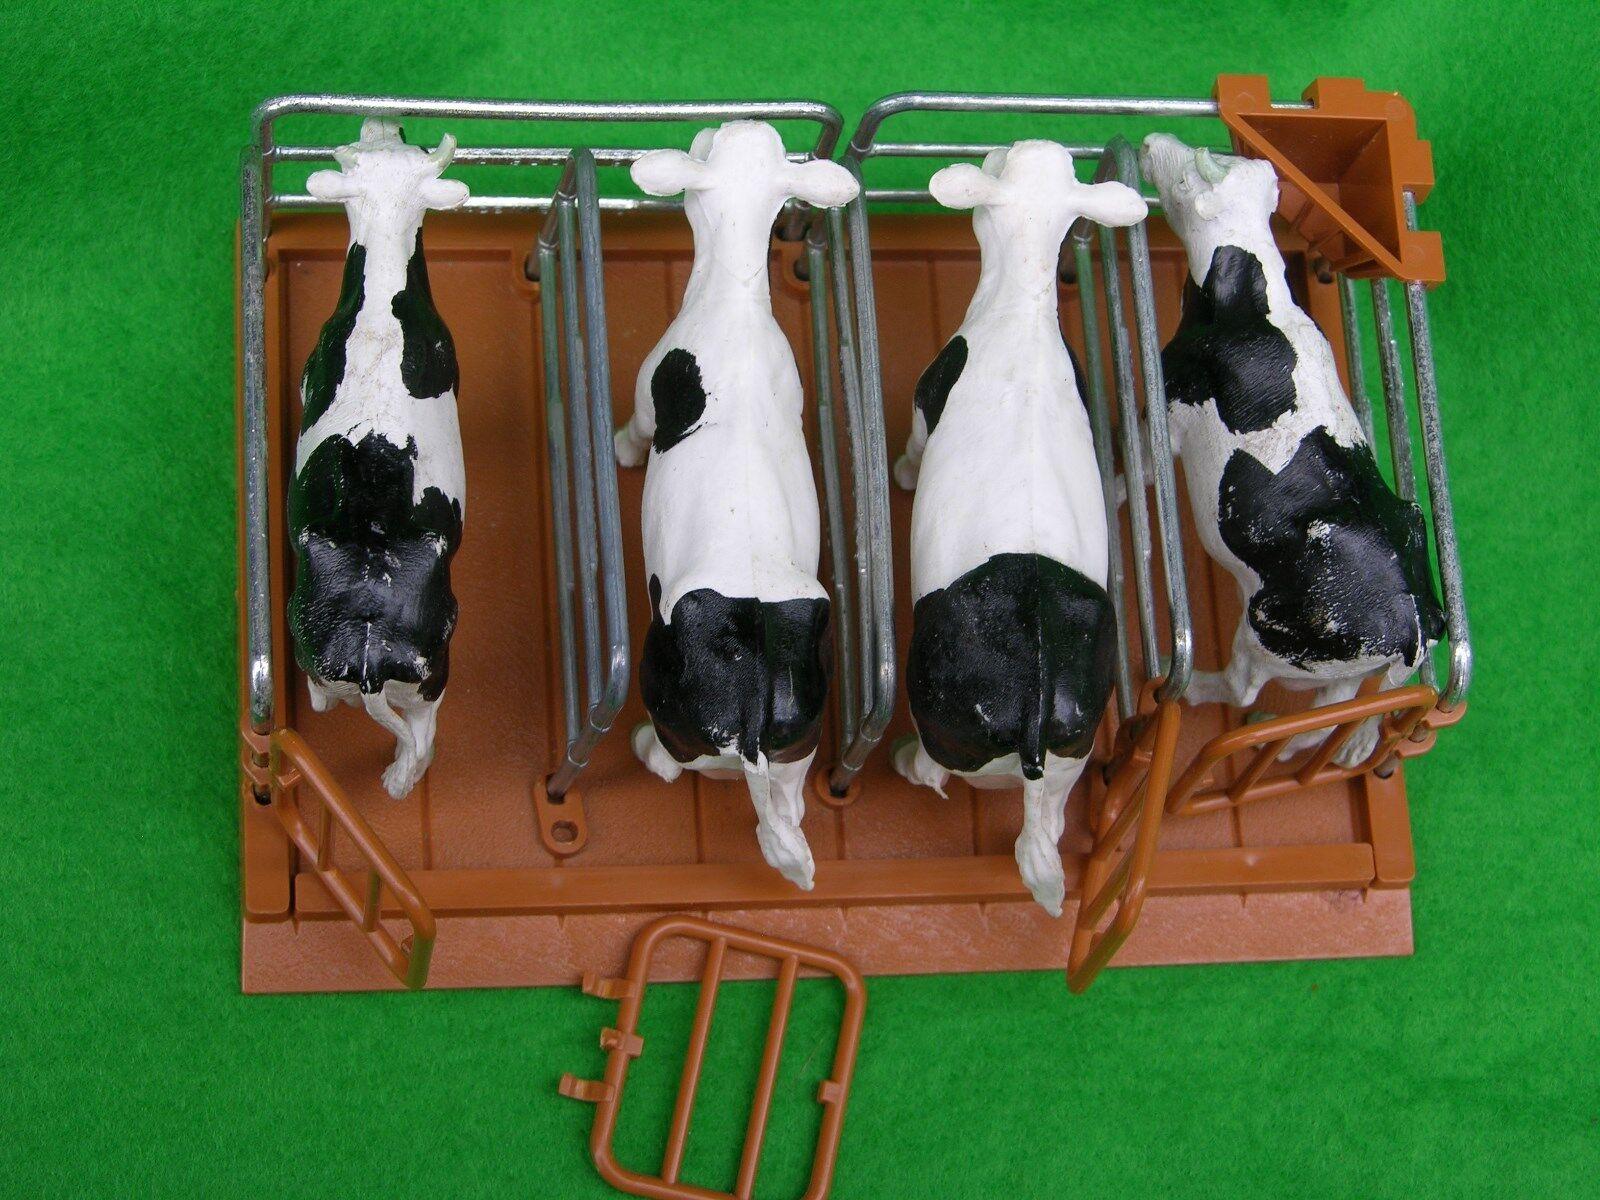 BRITAINS FARM ANIMALS,  CATTLE PENS, MILKING STALLS, FARM SET